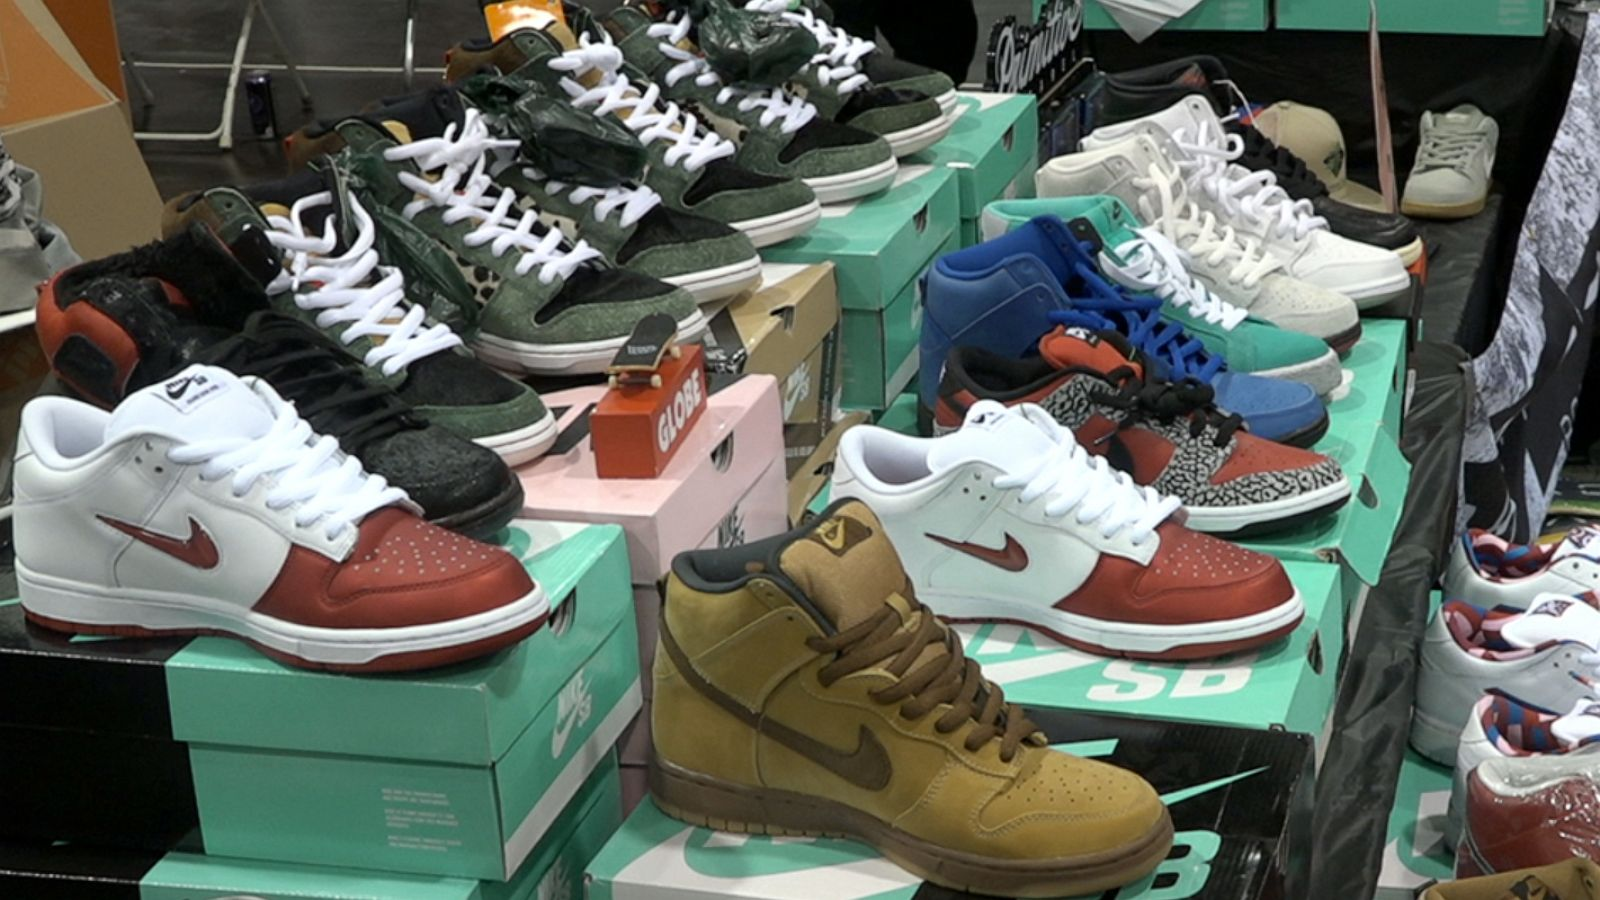 Sneaker Con is Comic Con for booming